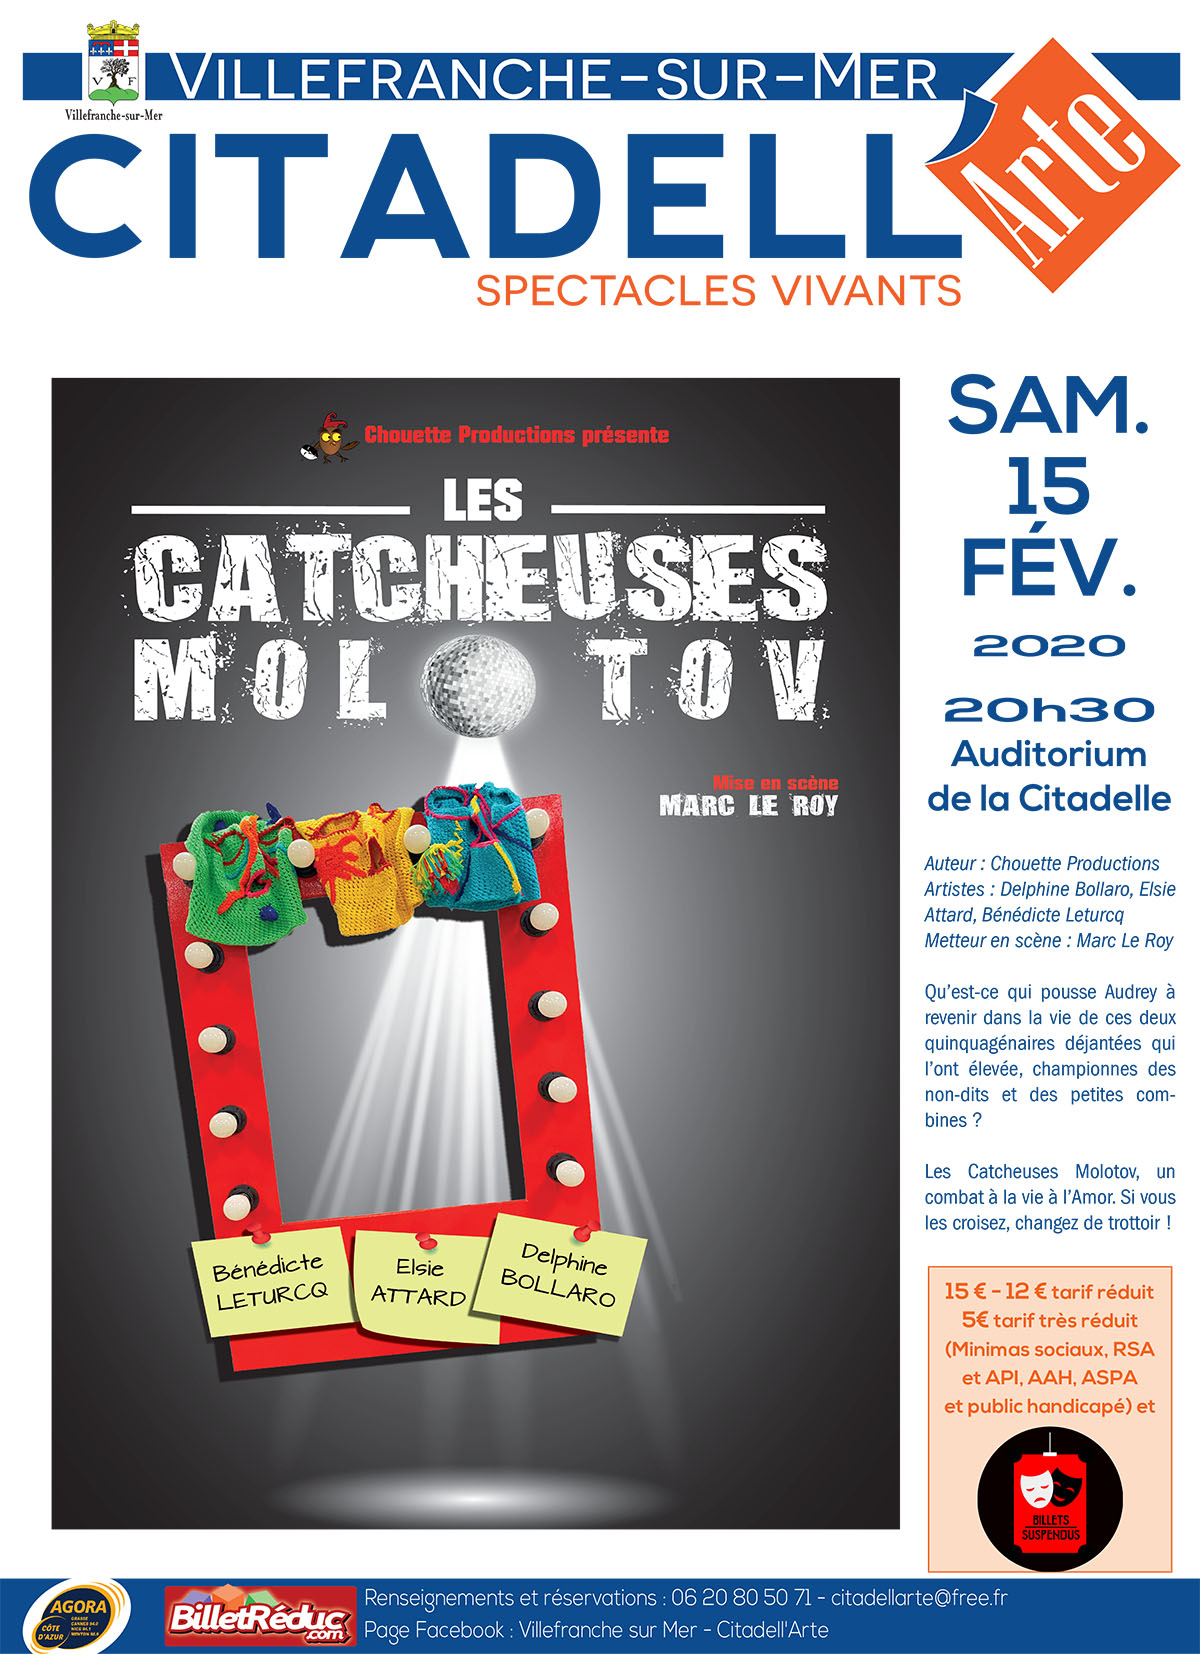 Citadell'Arte - Les Catcheuses Molotov